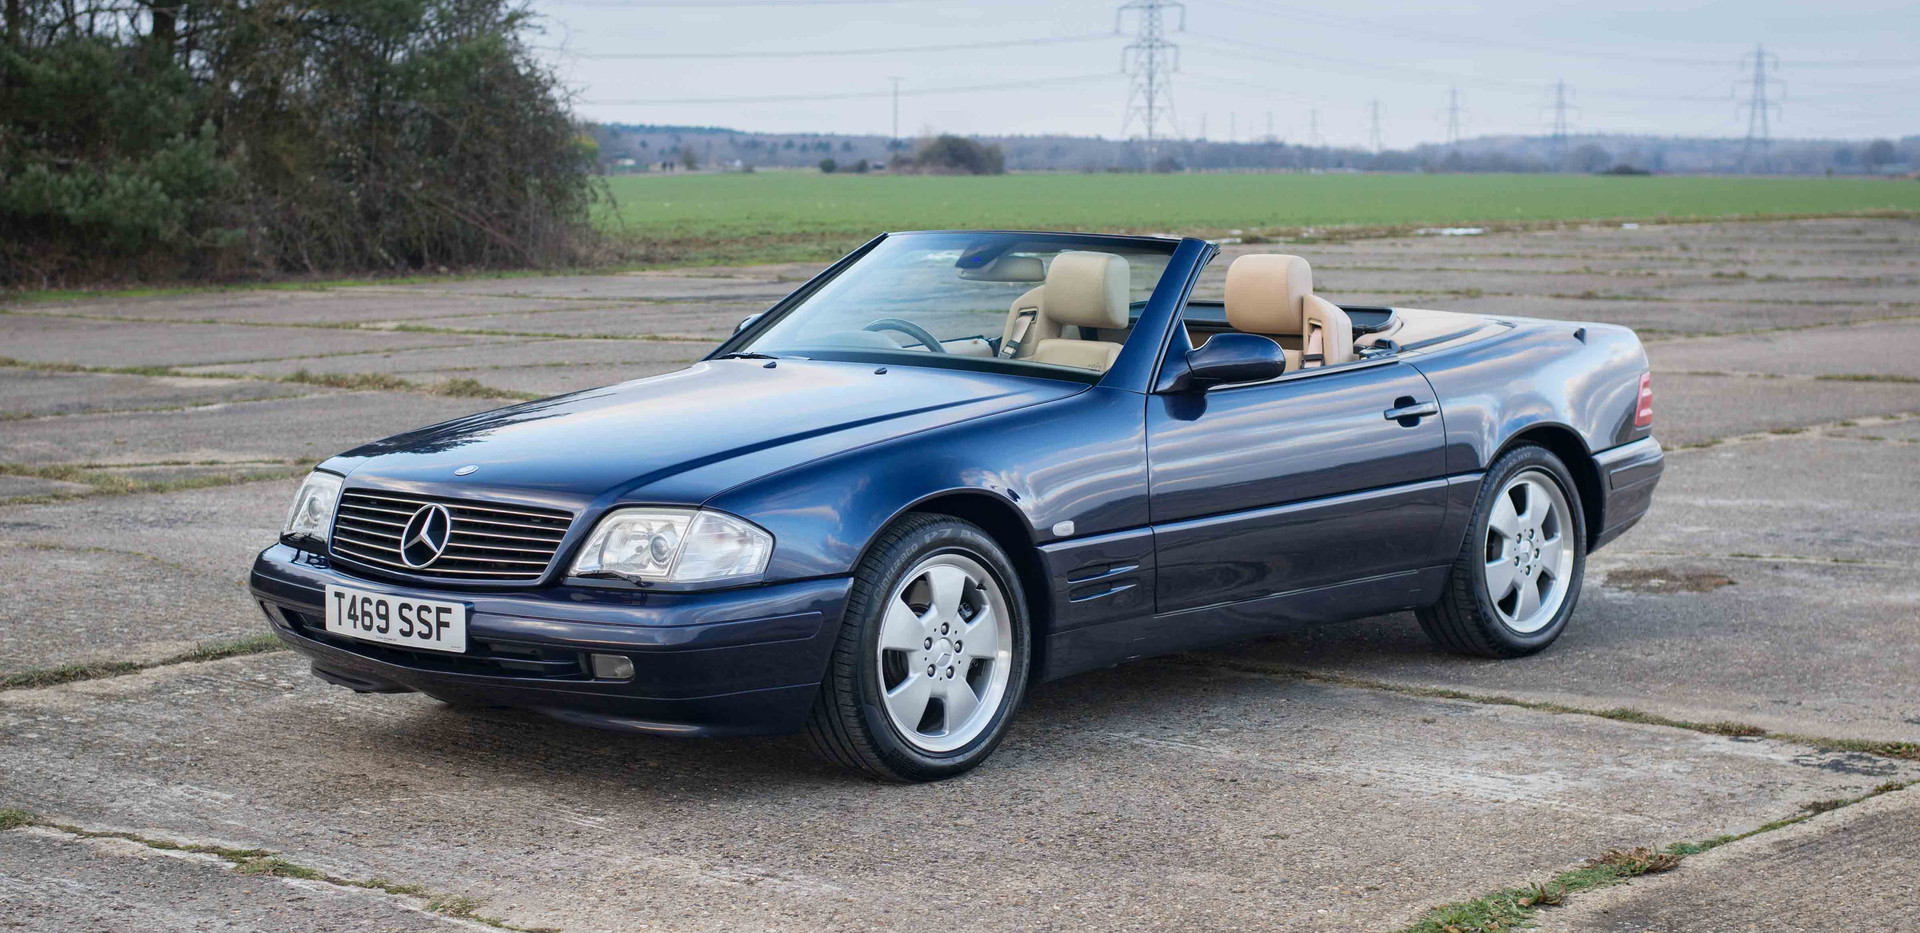 SL500 For Sale UK London  (12 of 36).jpg